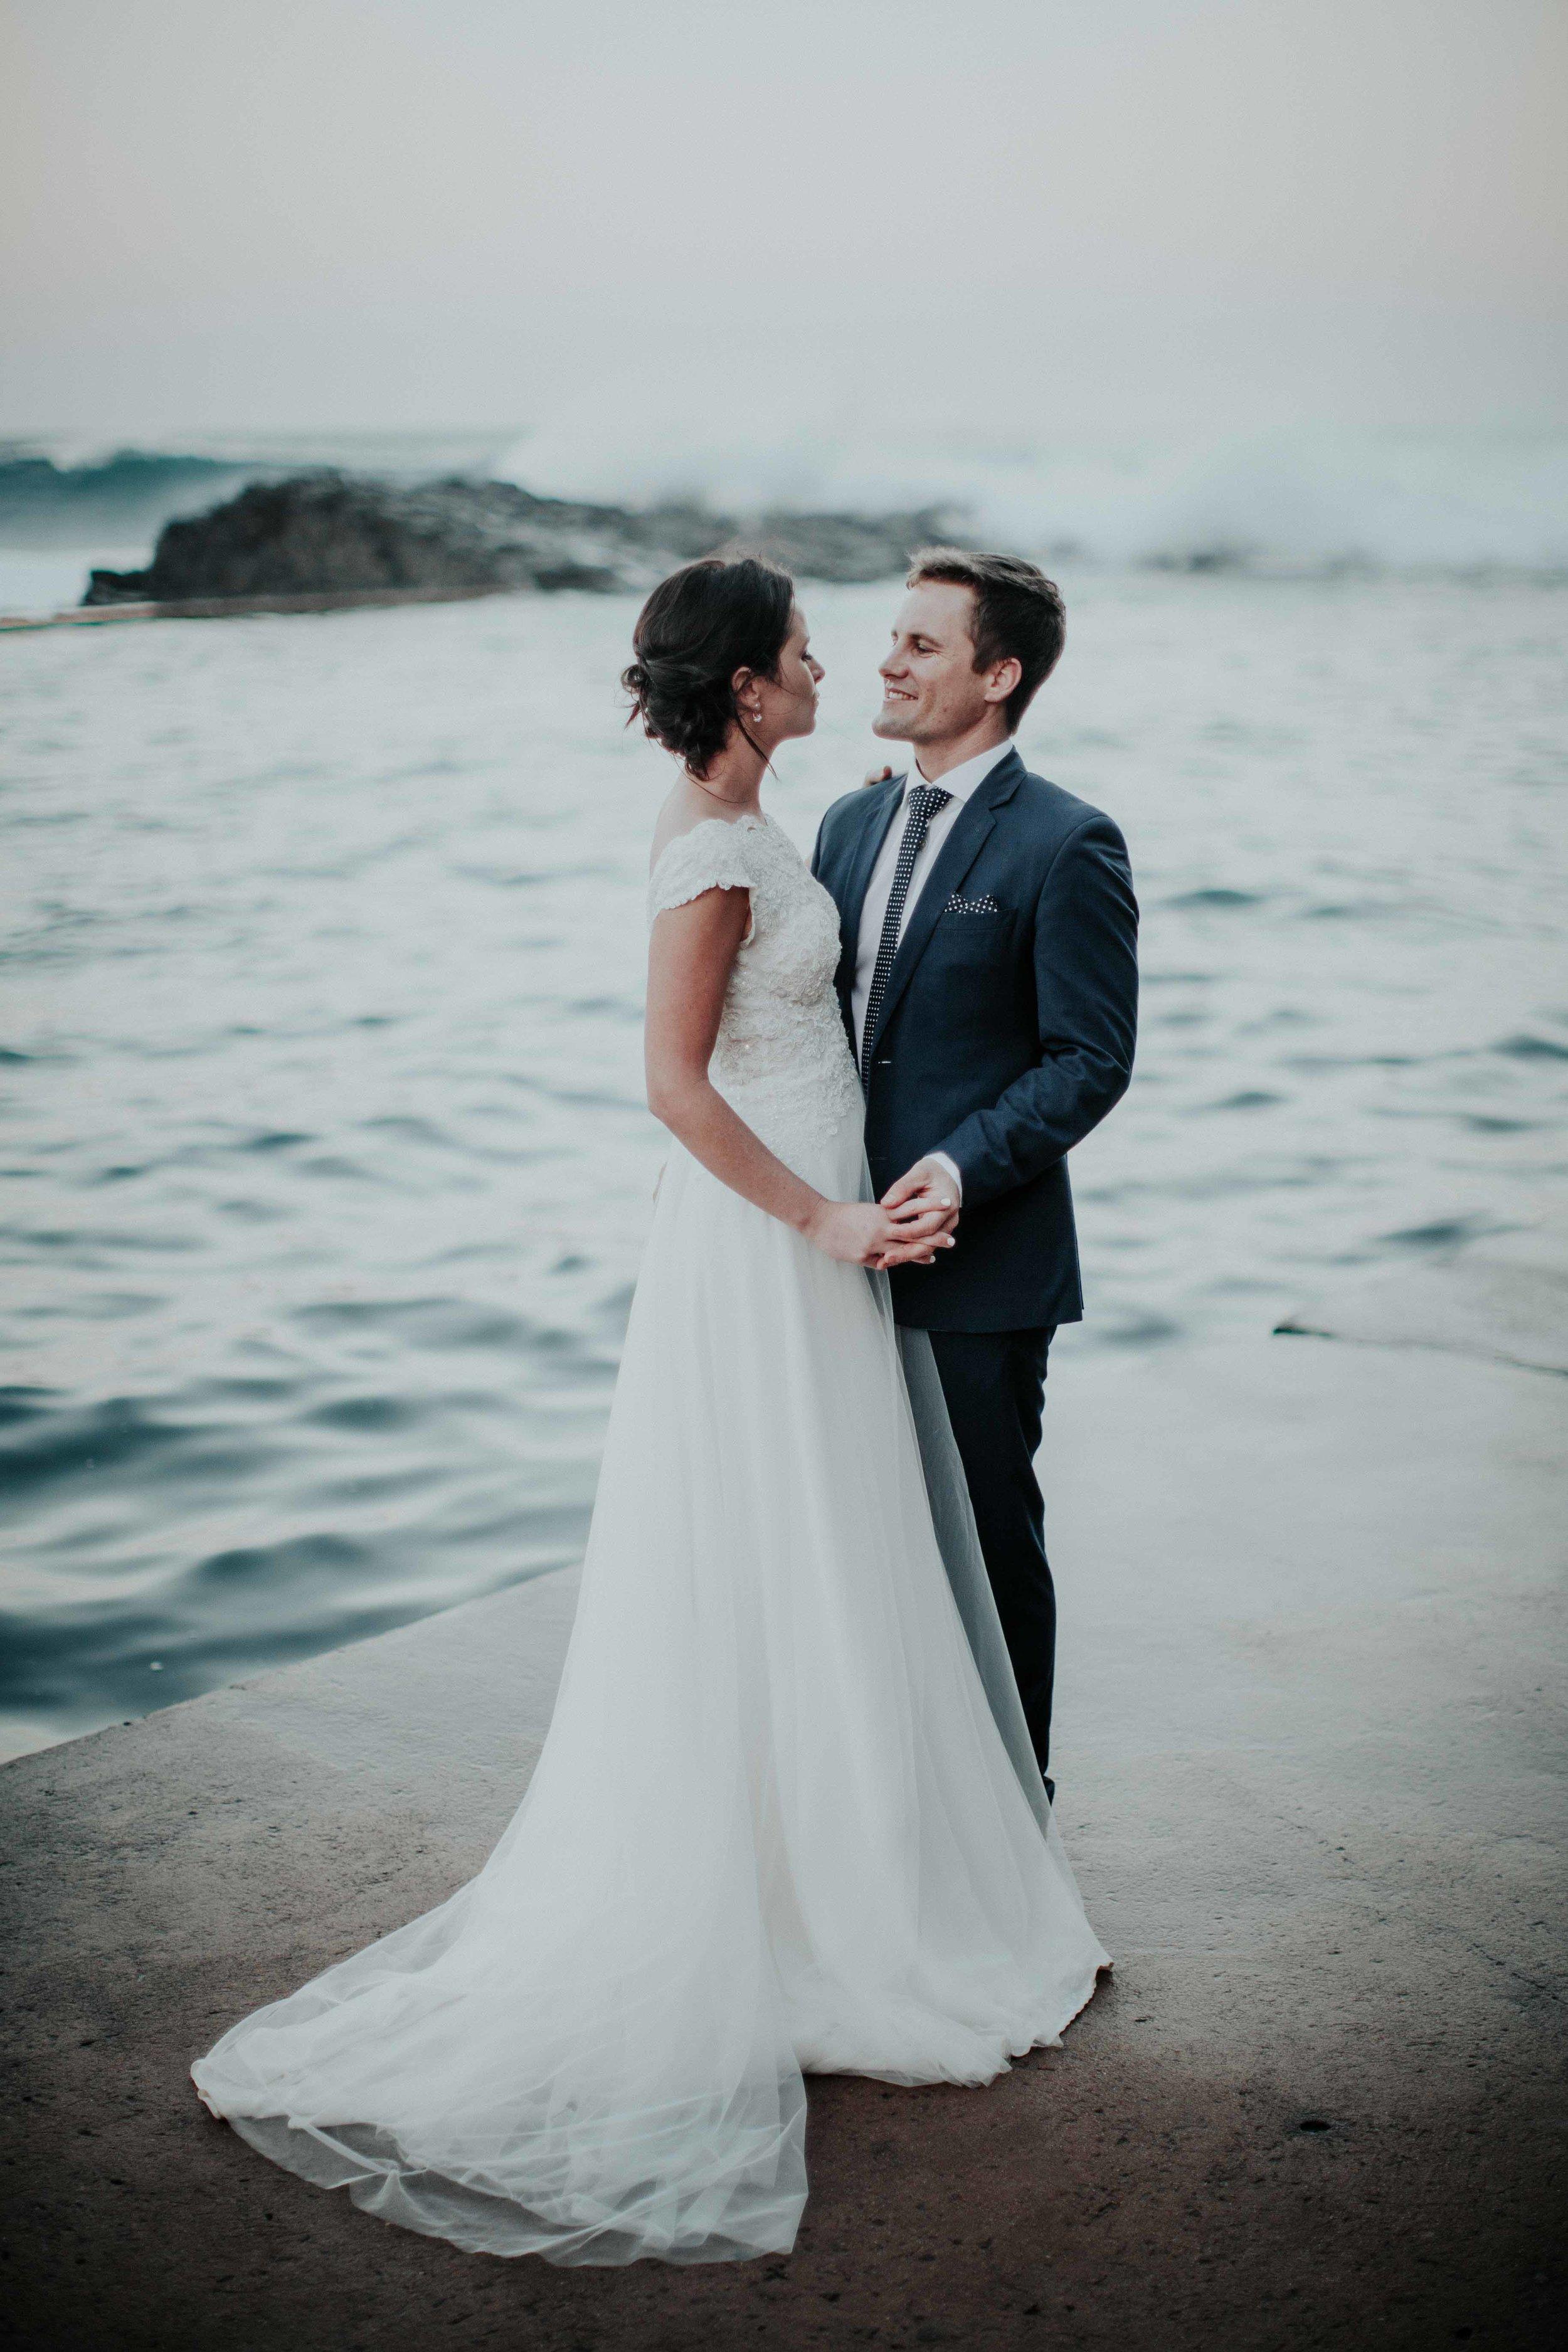 Kristi Smith Photography_Jimmy&Sinead_ Wedding Photographer 21.jpg